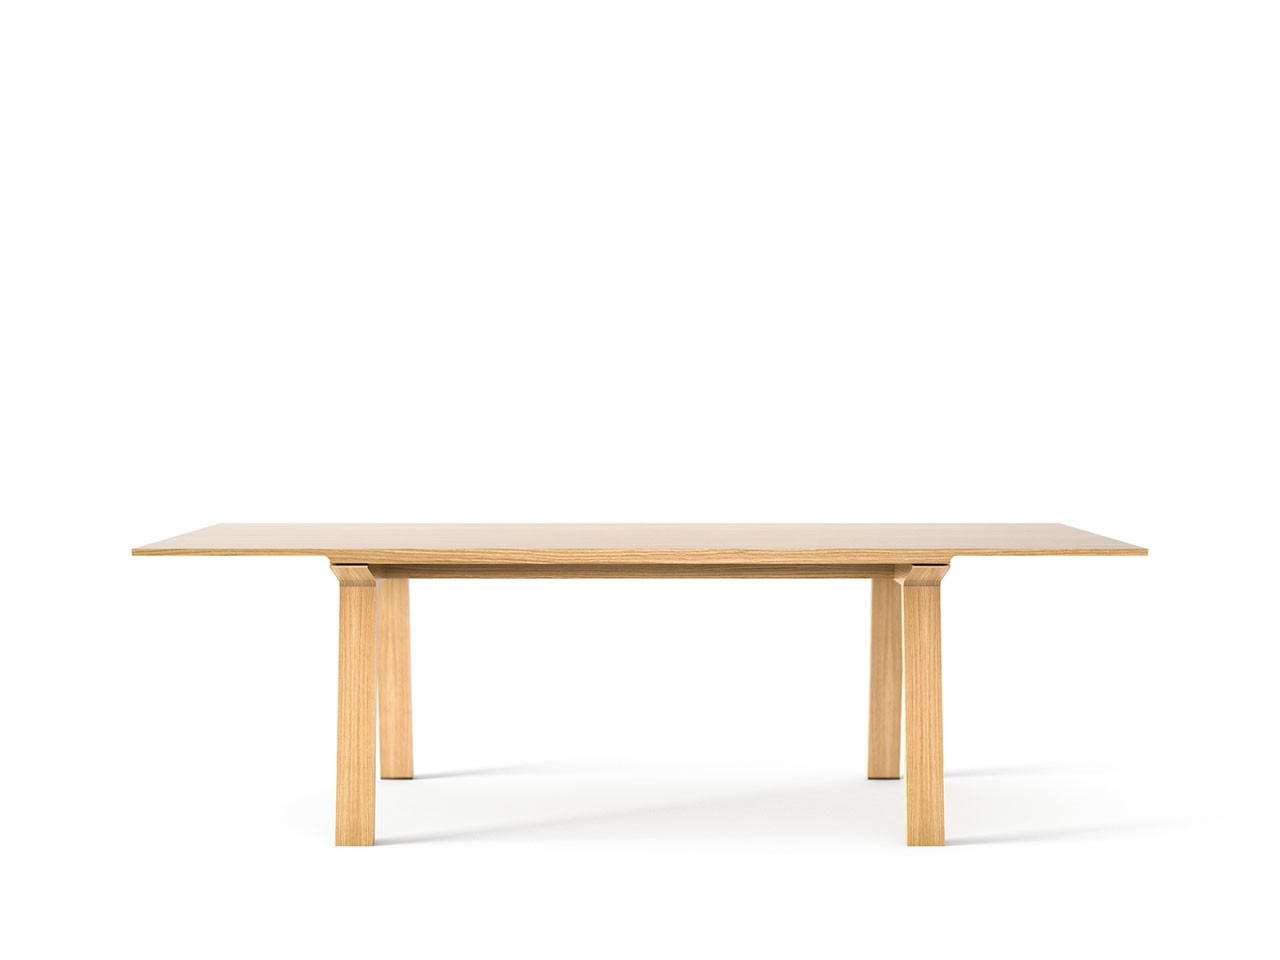 Mitis Dining Table, Rectangular Super-matt Oak, Super-matt Oak, 240cm